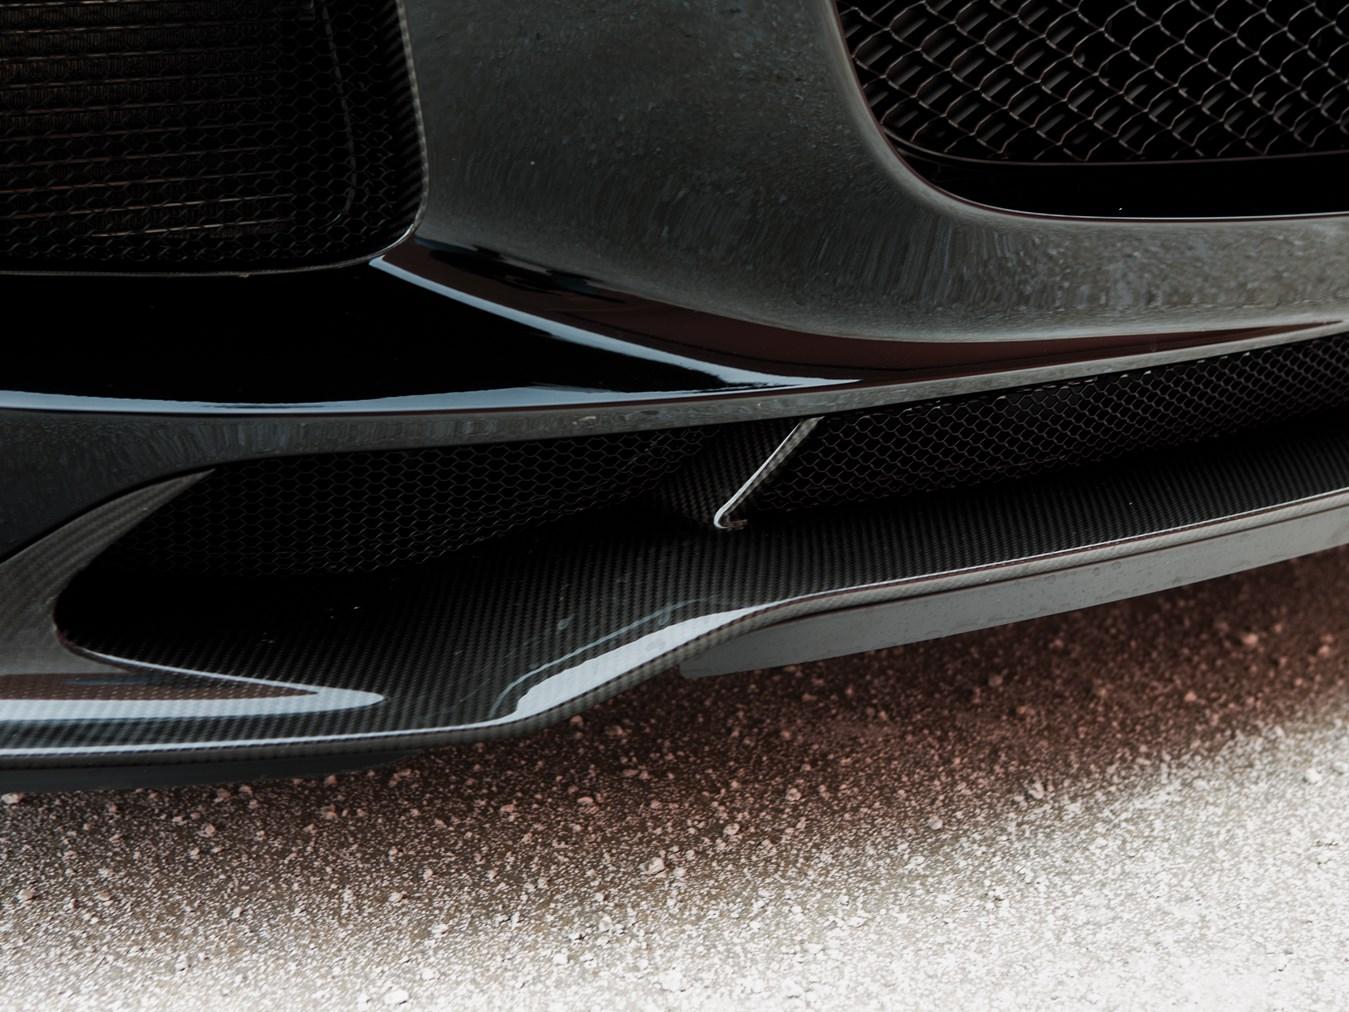 2014 Mercedes-Benz SLS AMG Black Series Coupe